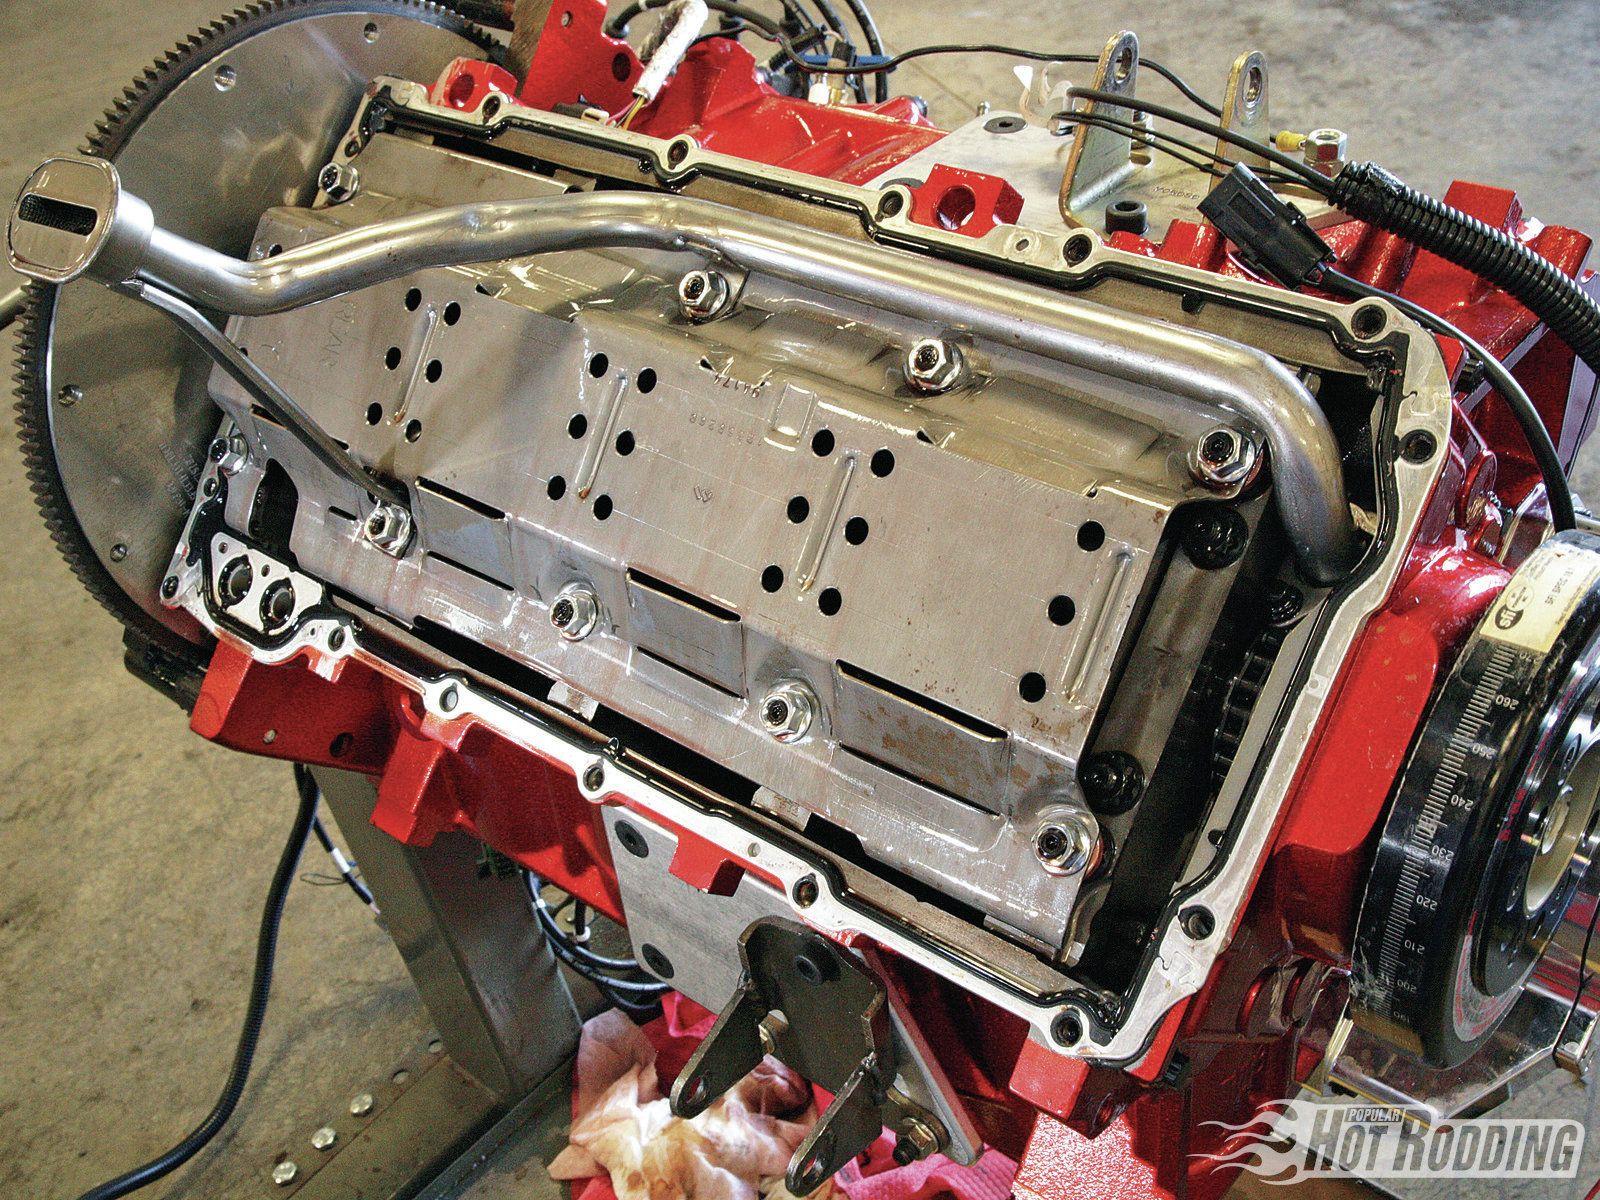 Racing Engine Design 6 0l Ls Chevy Motor Popular Hot Rodding Magazine Chevy Motors Chevy Engineering